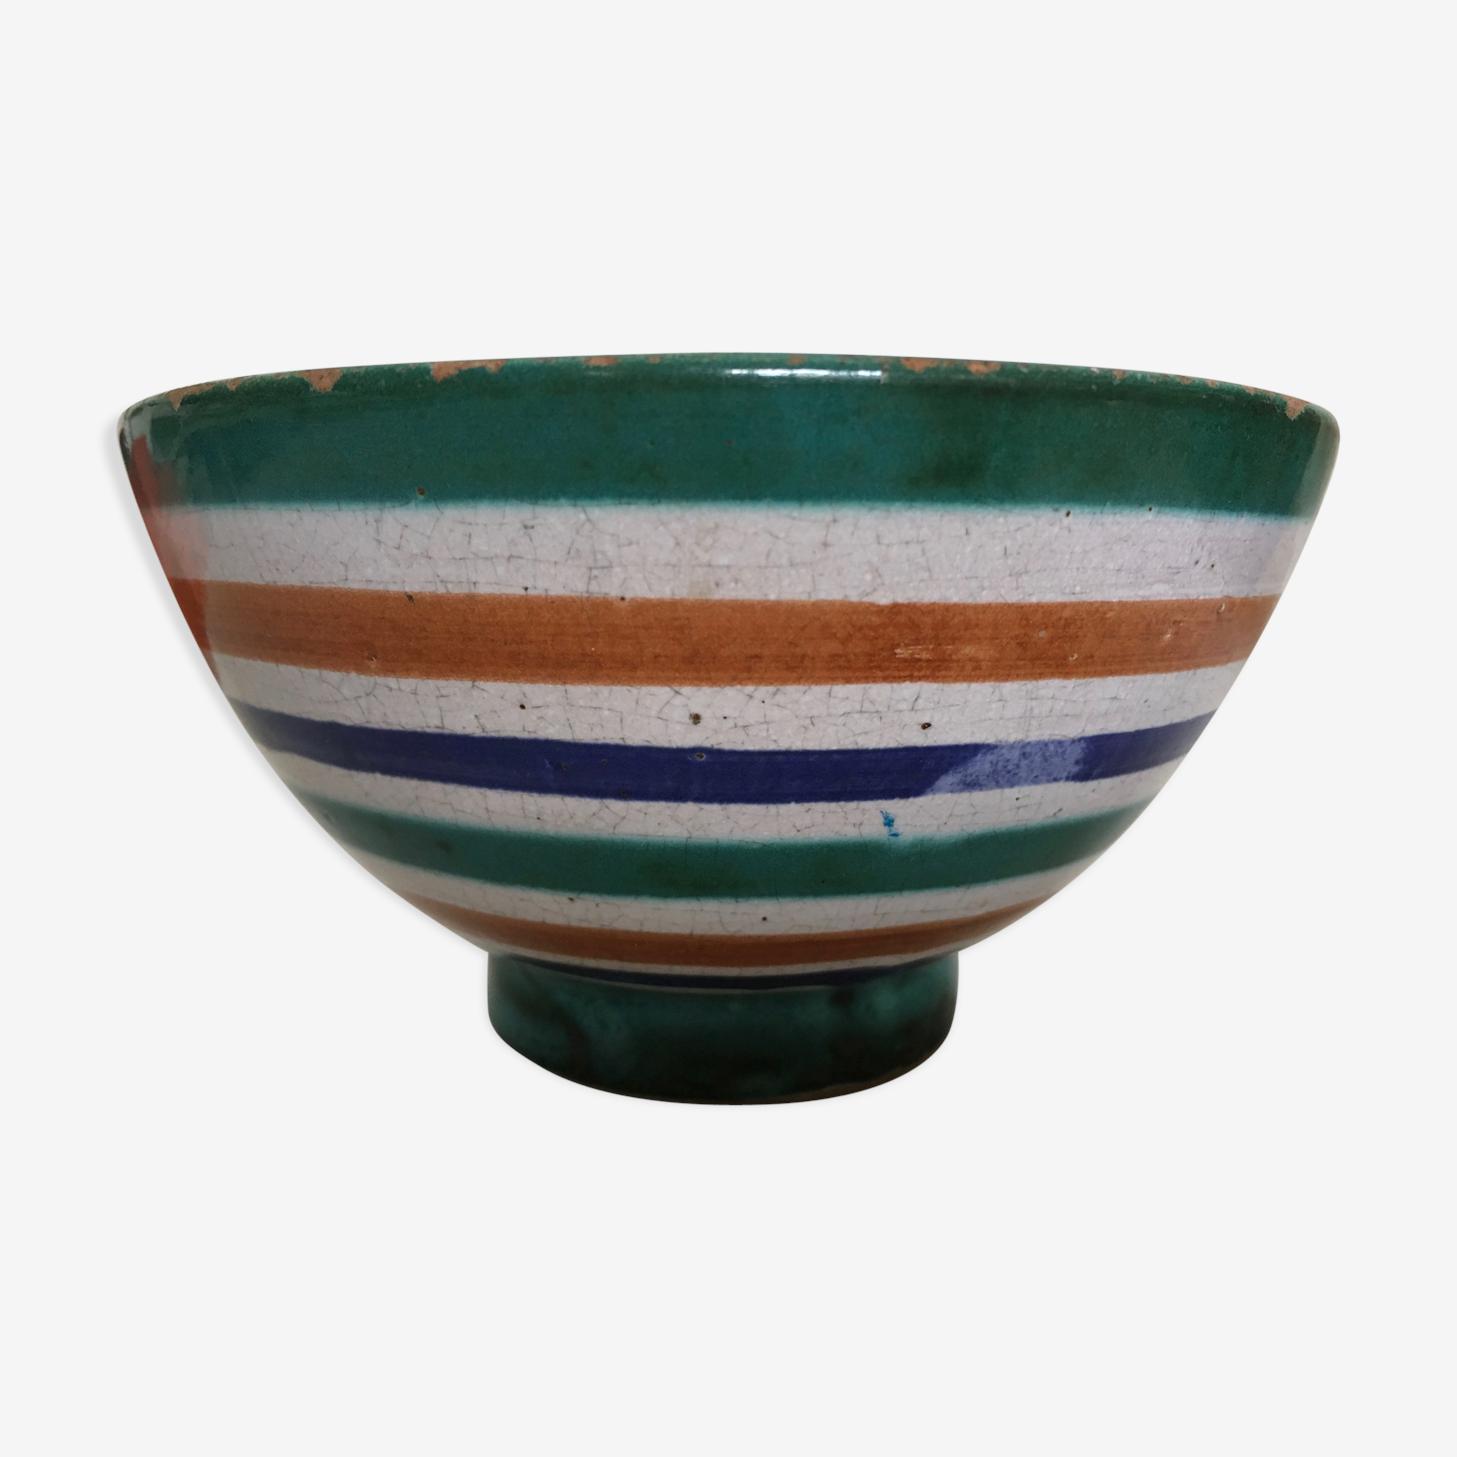 Bol de céramique Robert Picault décor de rayures vert bleu tabac